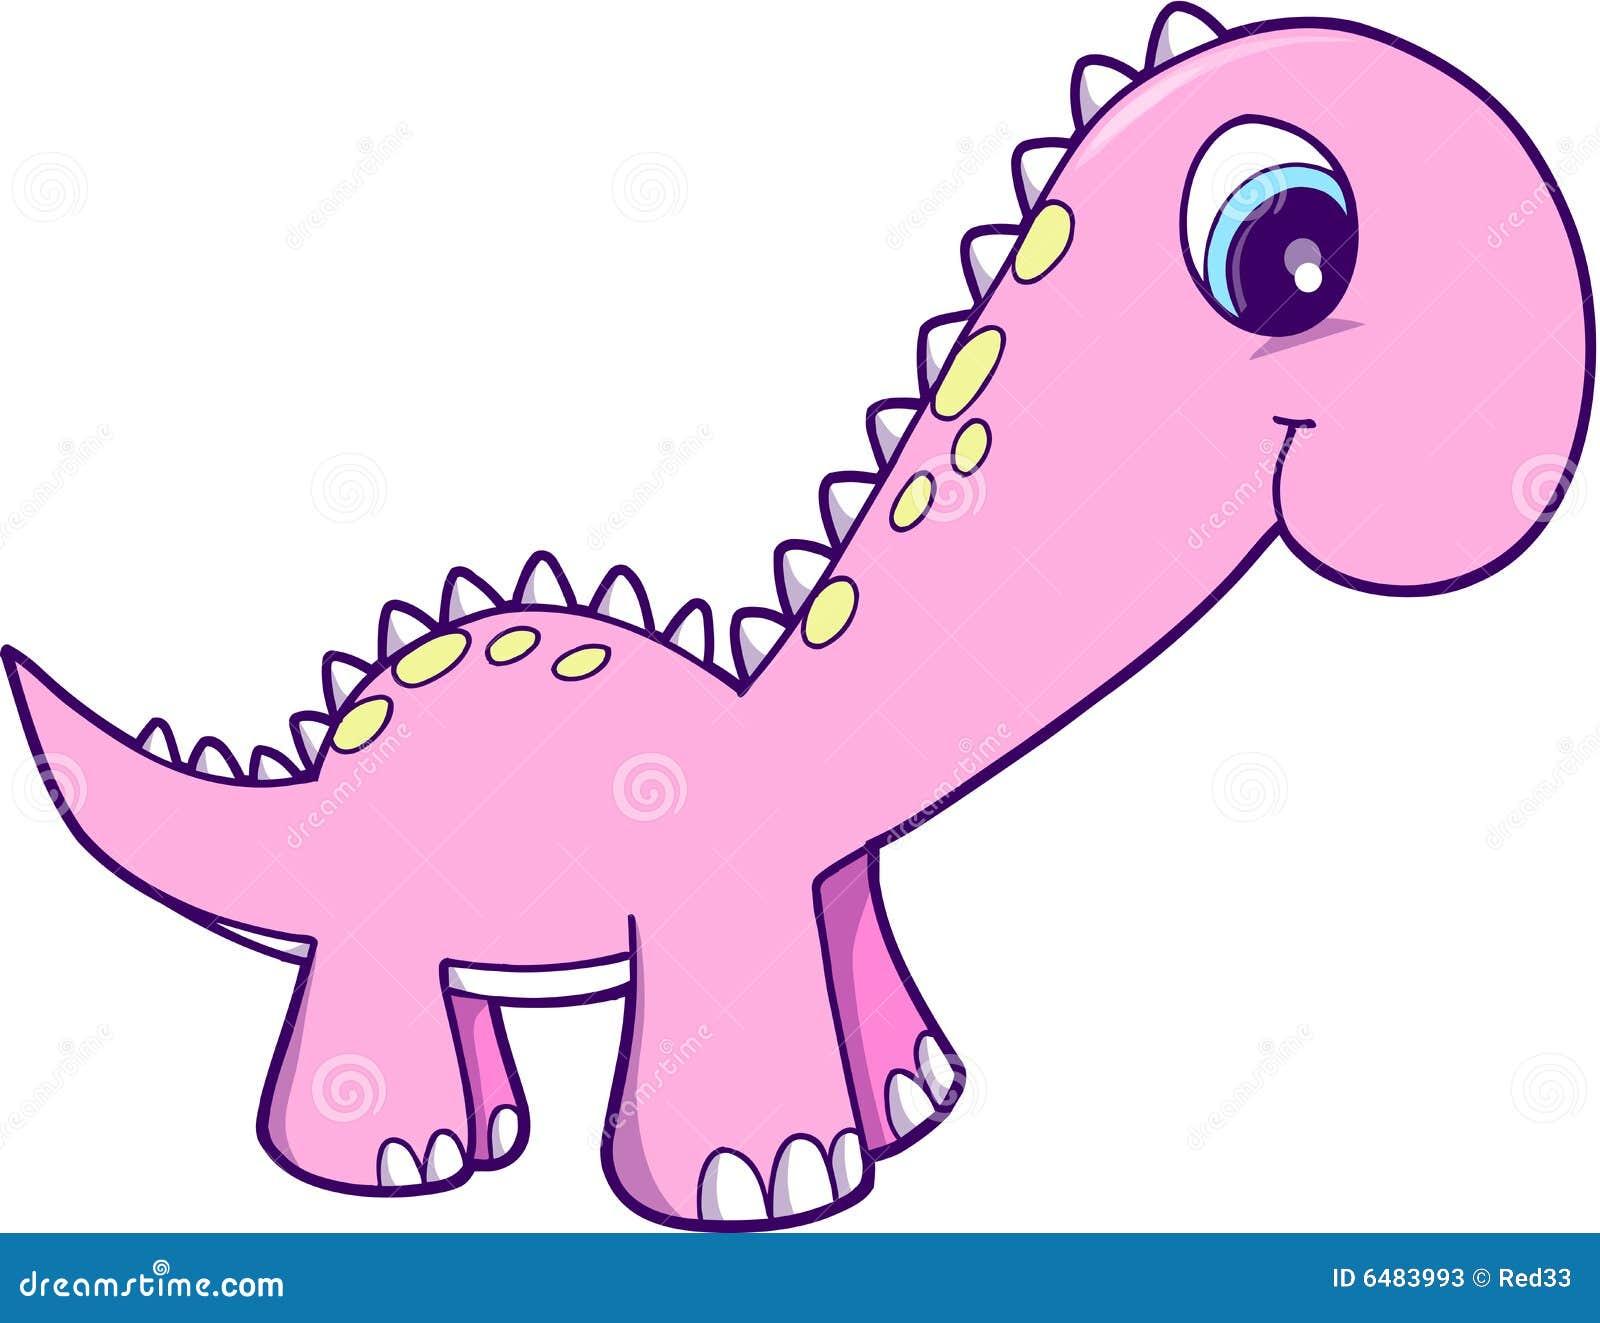 Dinosaur Vector Illustration Stock Photos - Image: 6483993